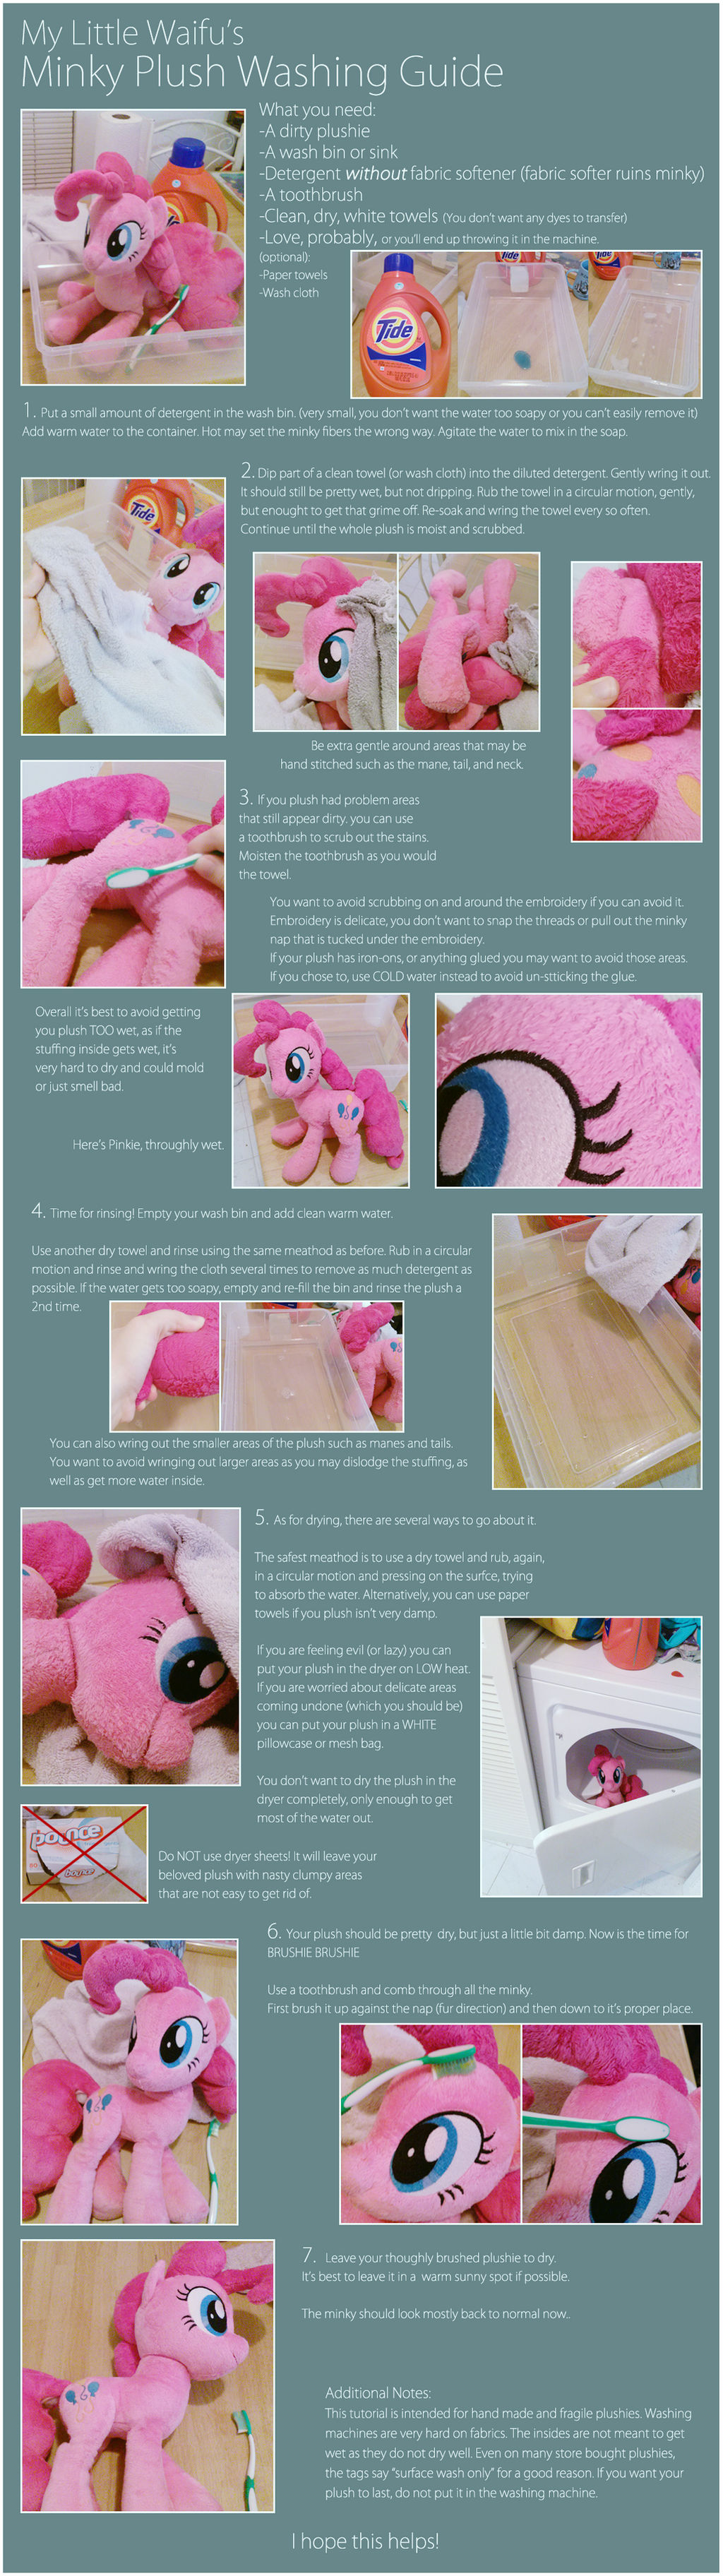 Minky Plush Washing Guide by ButtercupBabyPPG